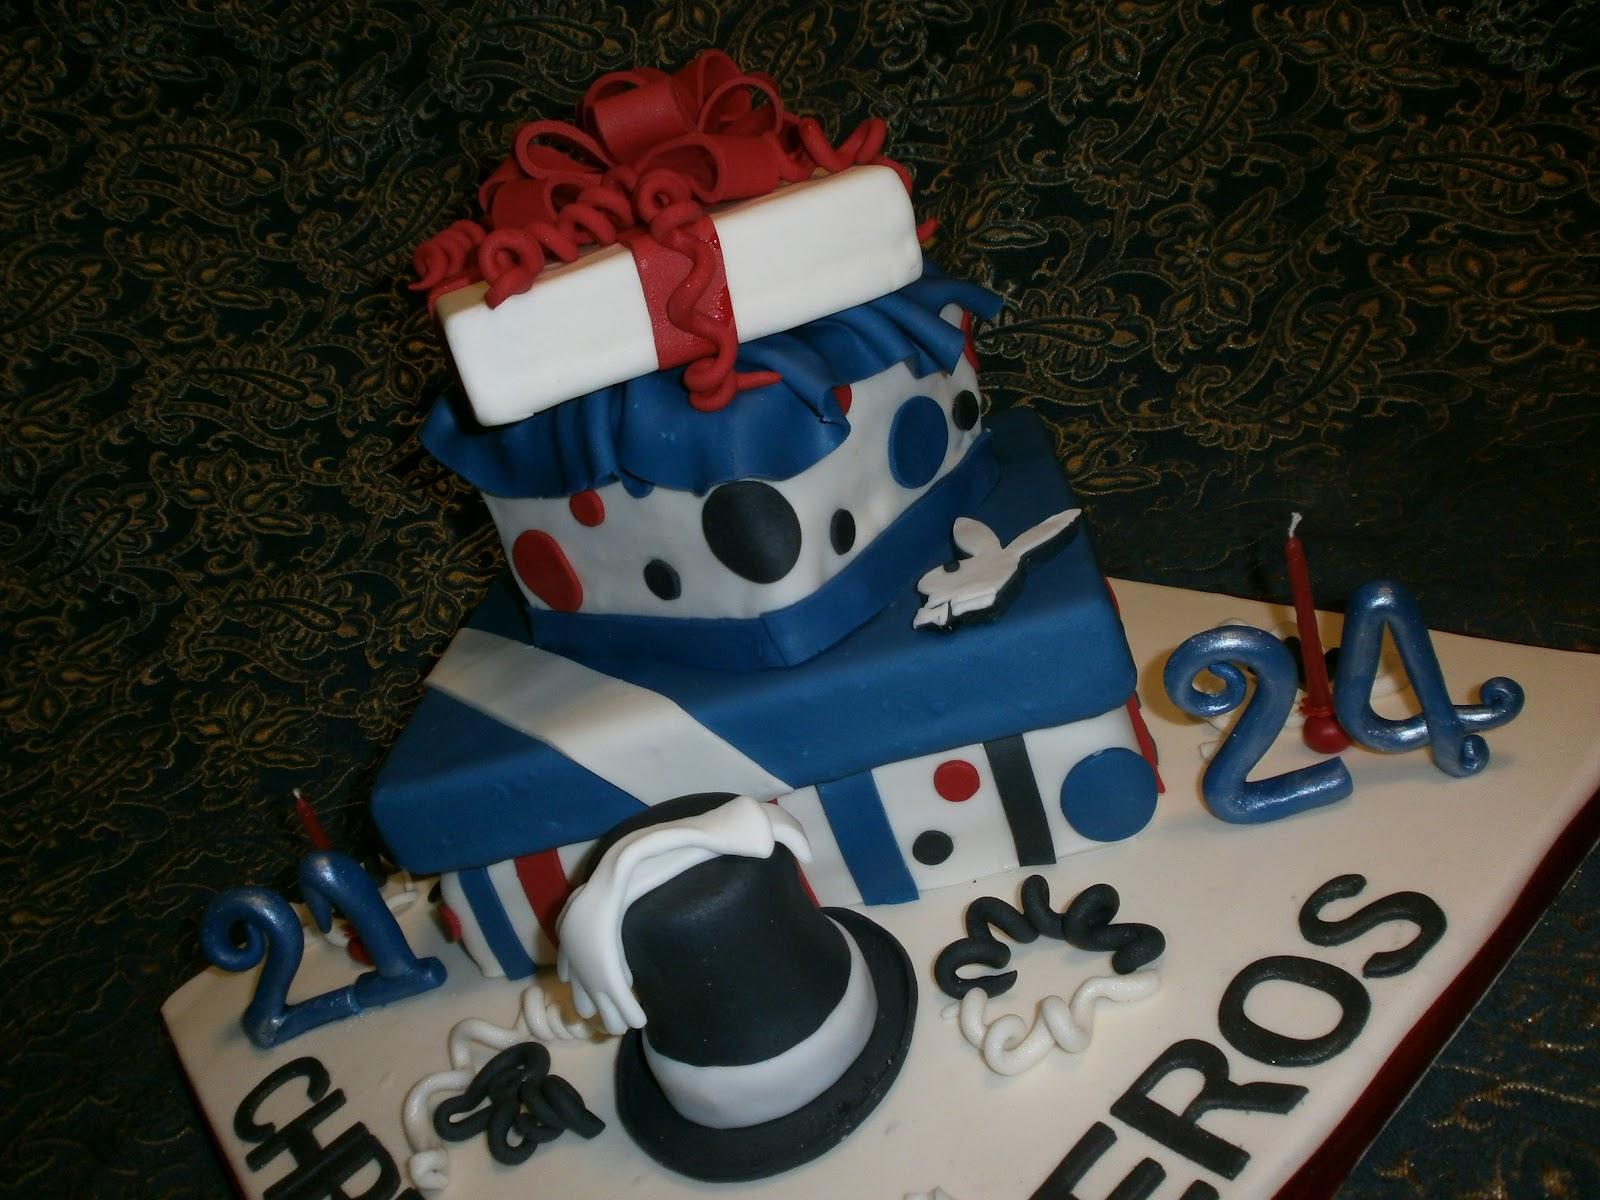 Torte di compleanno , torte per adulti , torte per eventi